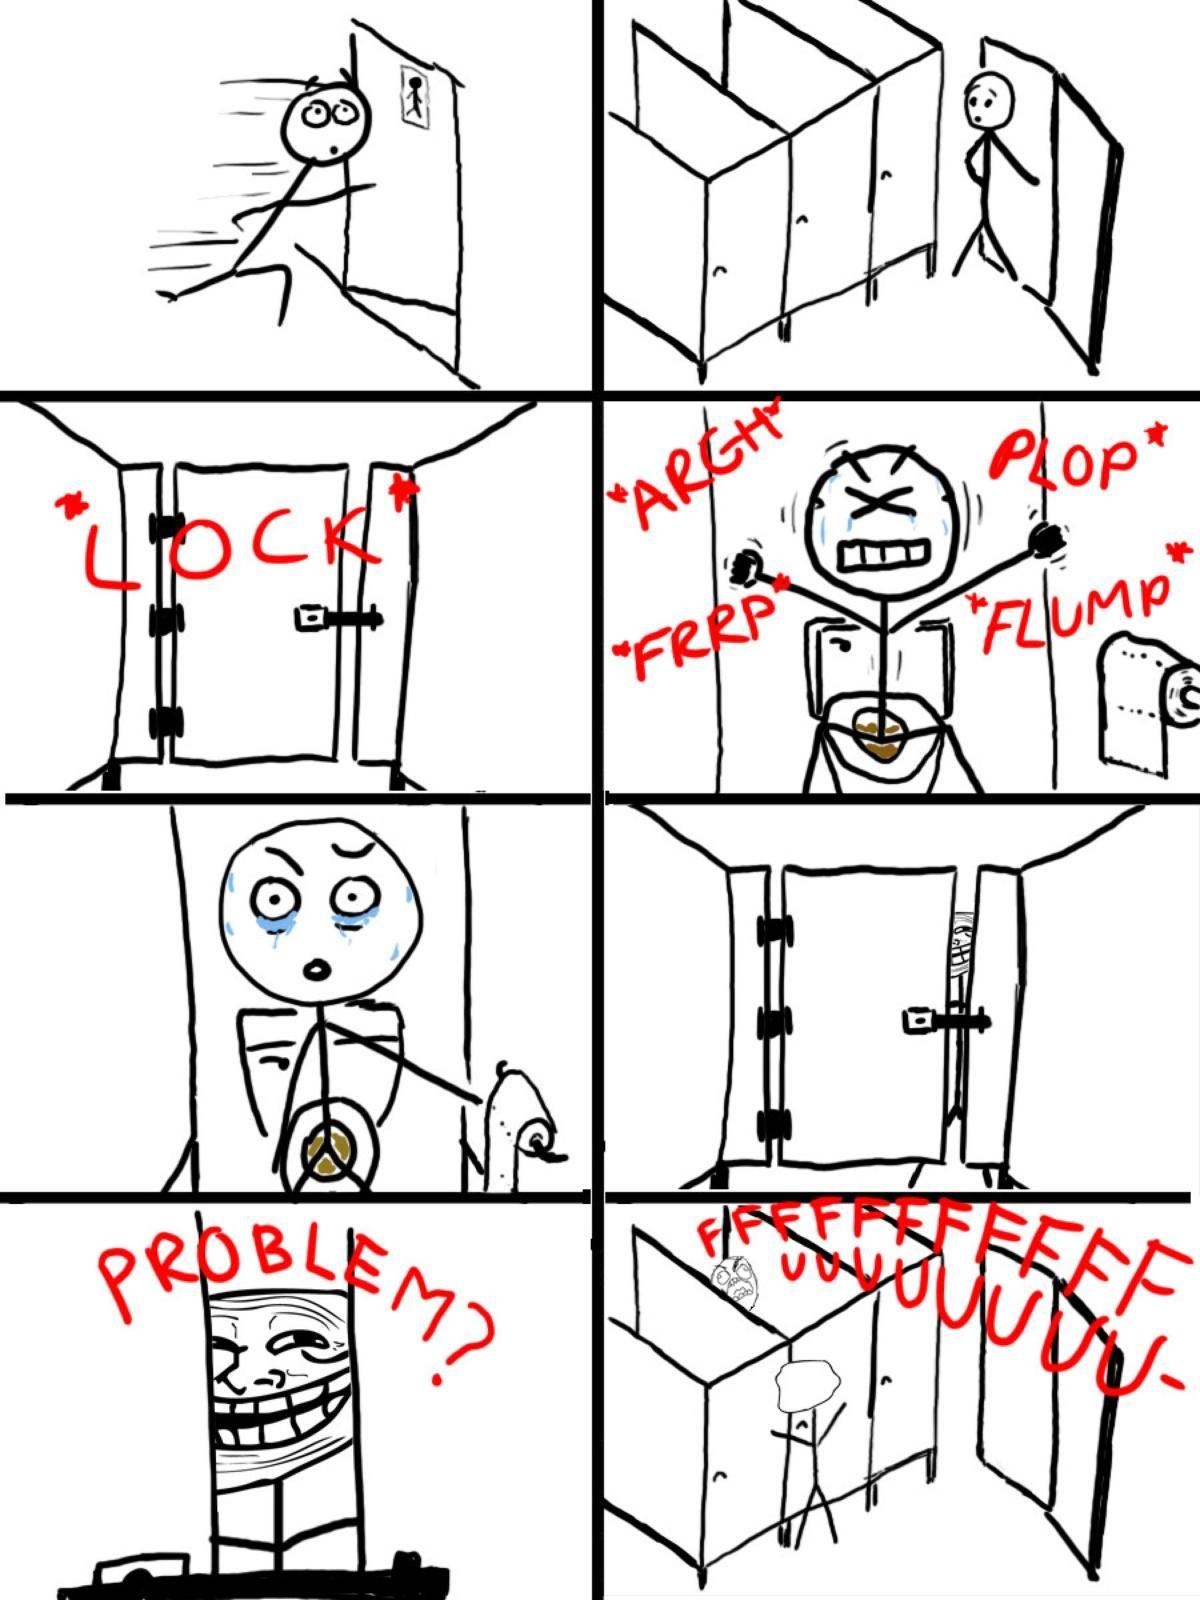 Public Toilet Cubicle Gap Troll Rage